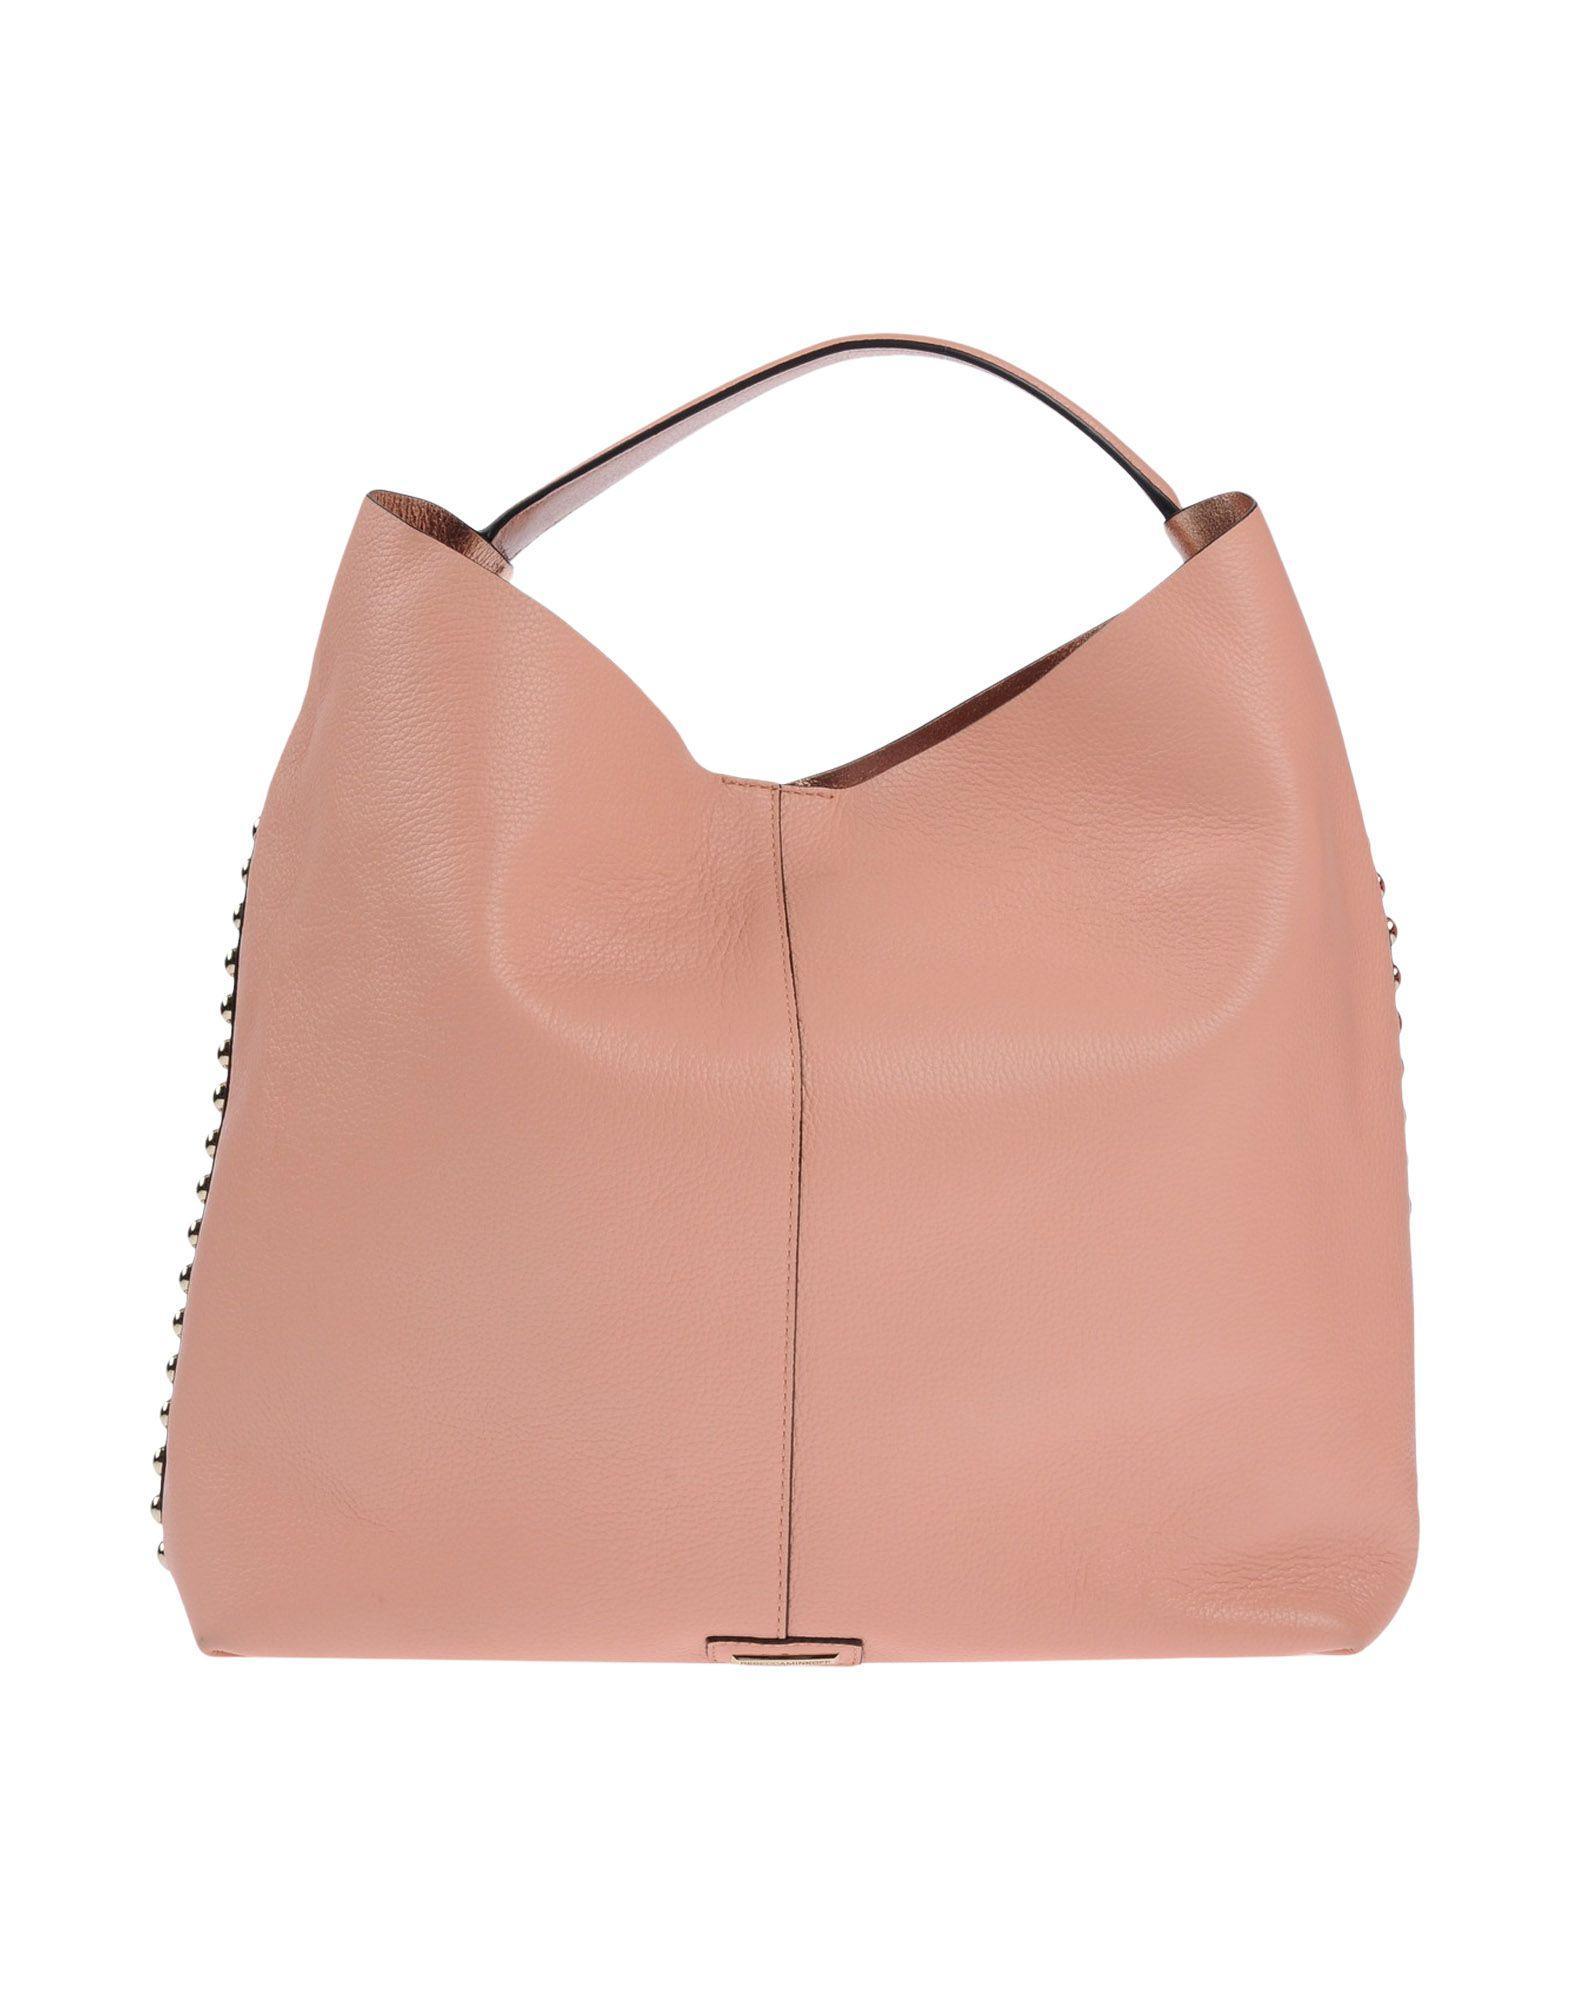 Rebecca Minkoff Handbag In Salmon Pink